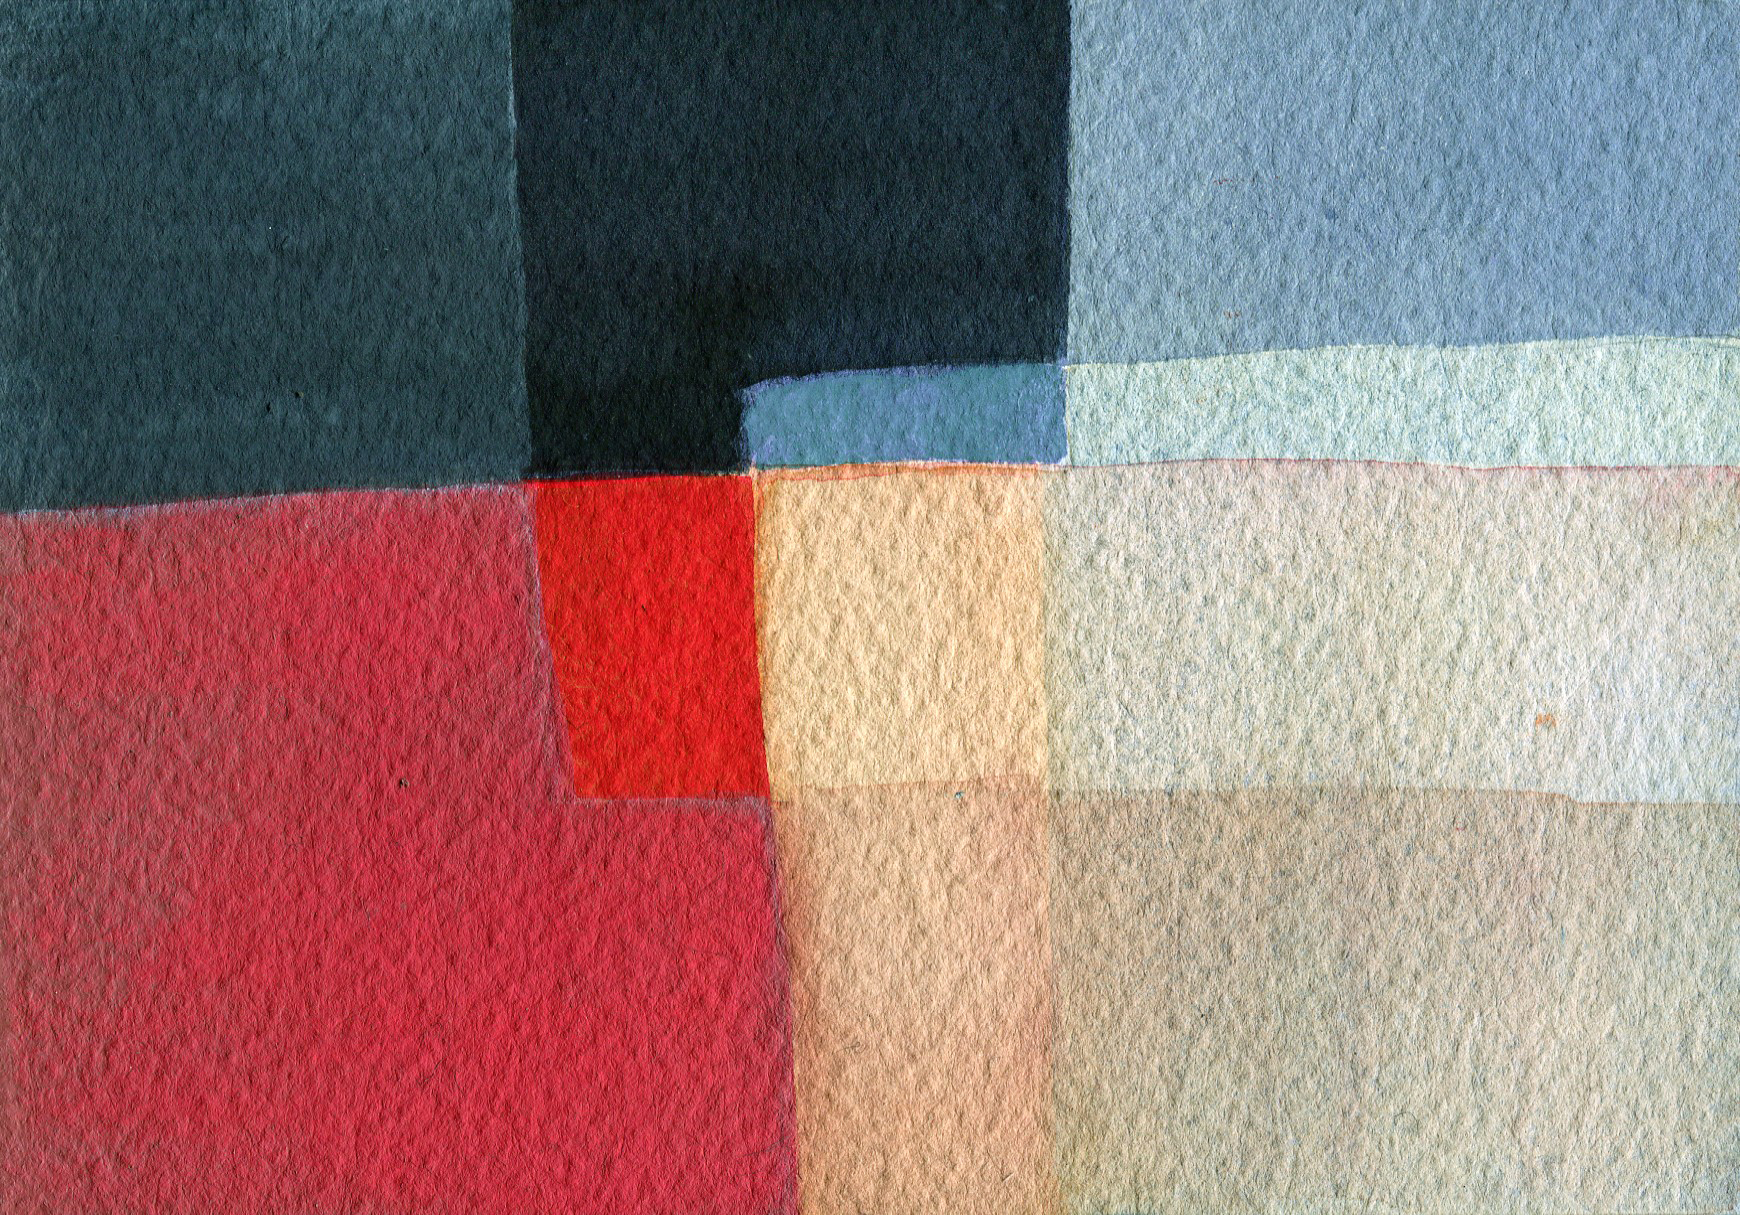 Tooney Phillips - Untitled 2.jpg